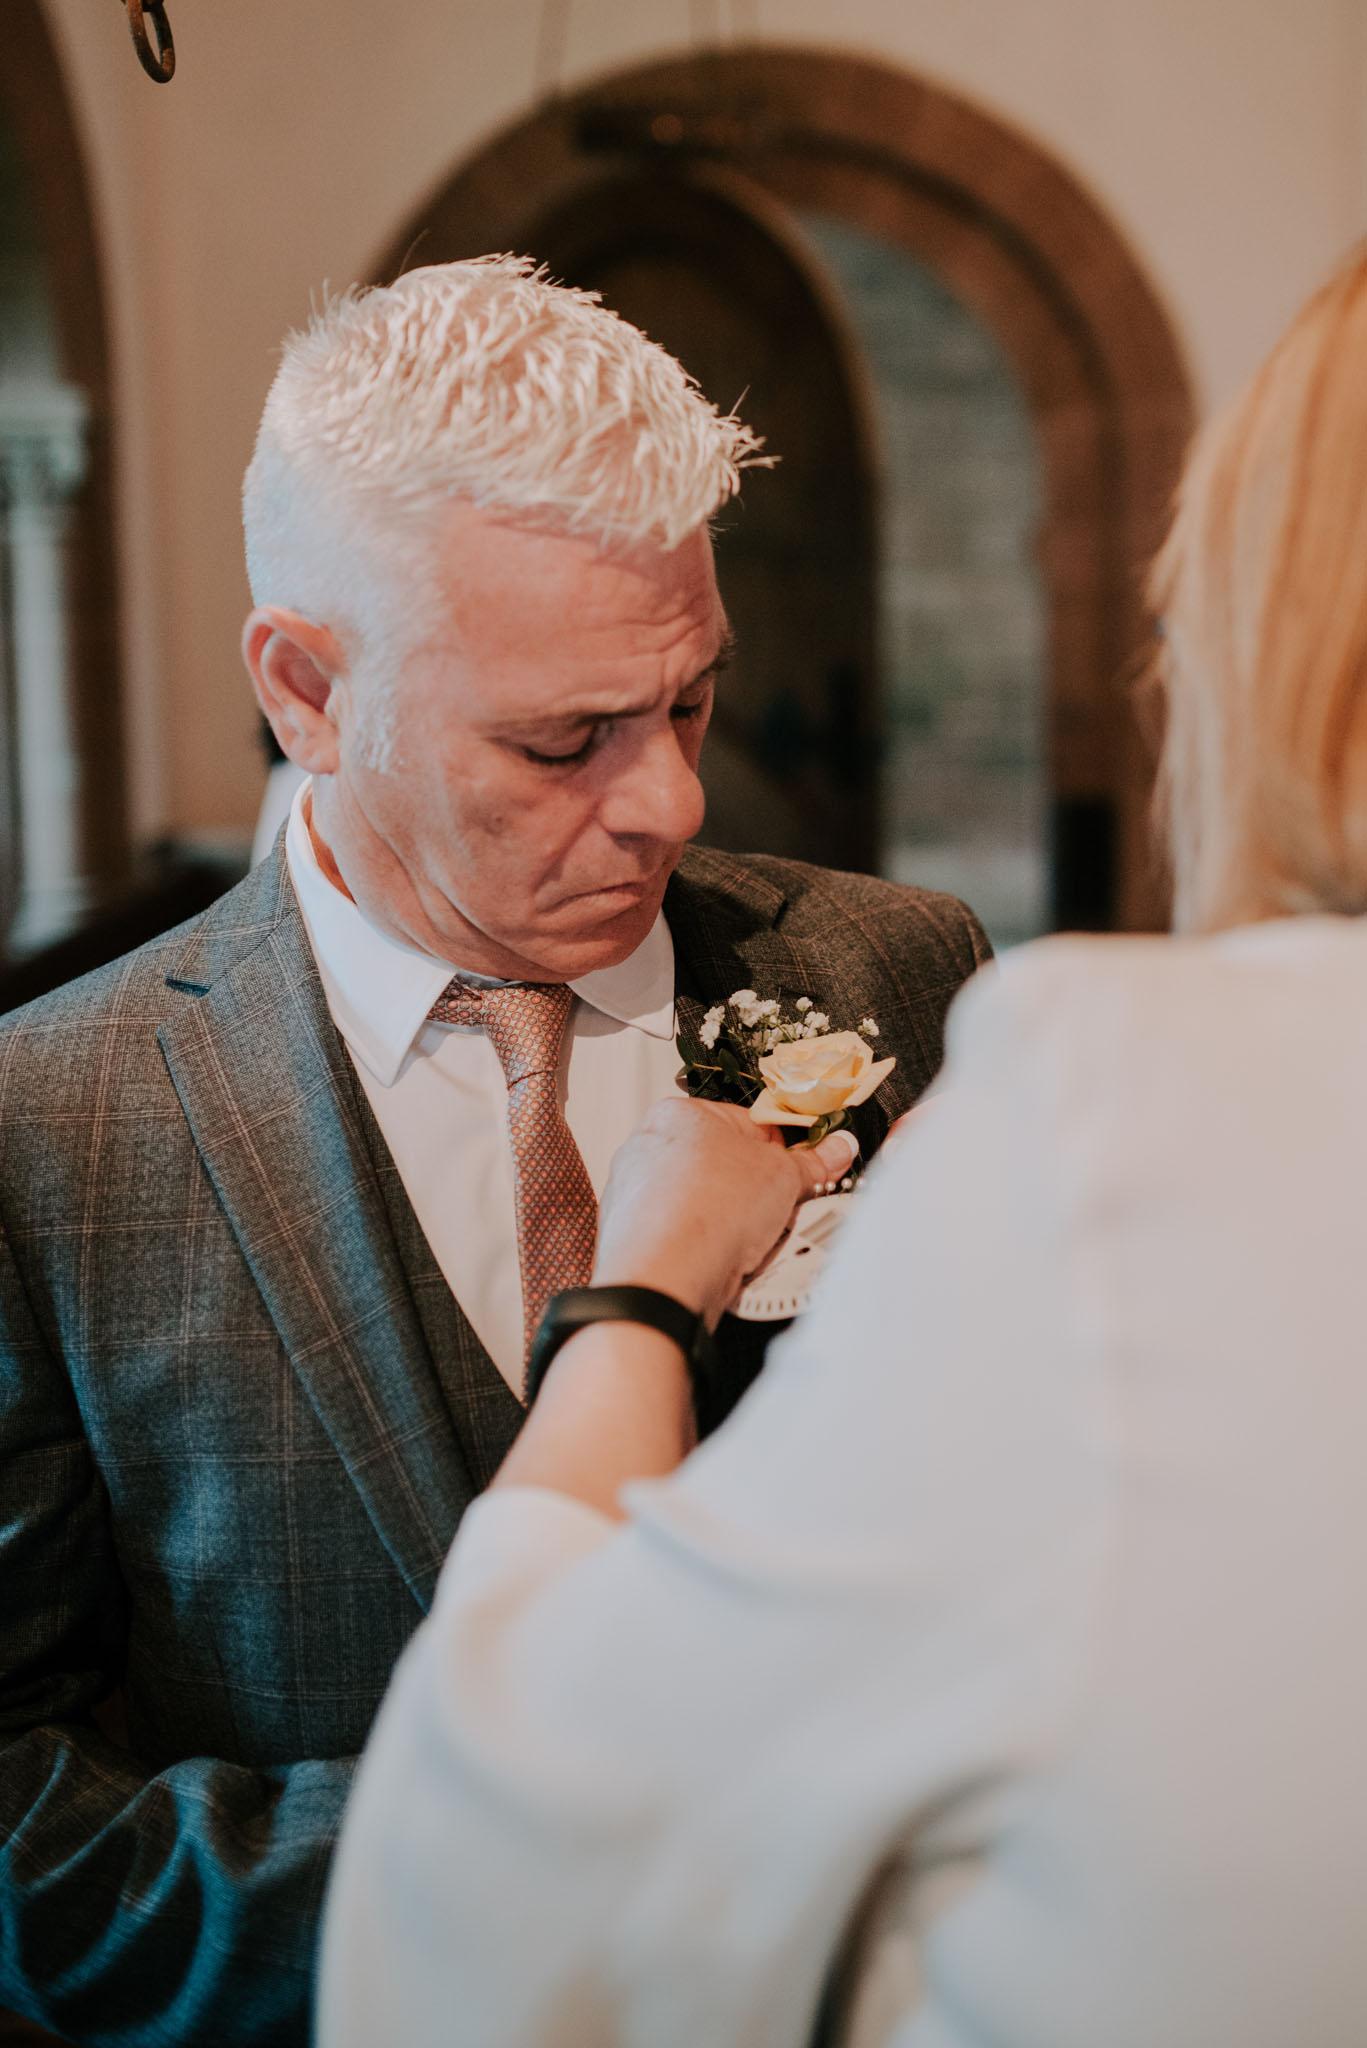 wedding-photographer-glewstone-court-hereford-scott-stockwell-photography125.jpg